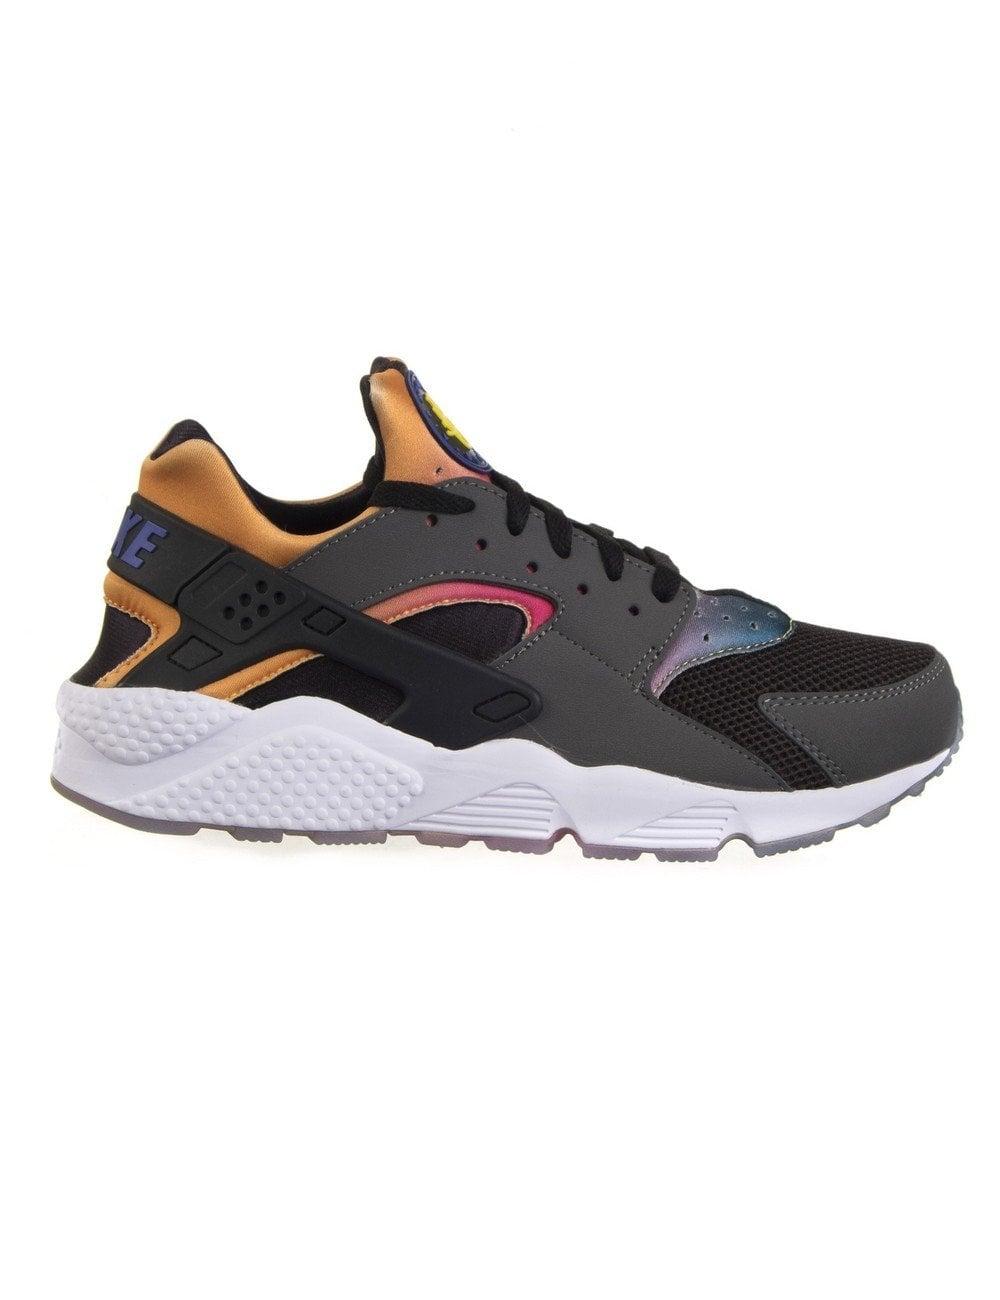 a81ff5b360f5 Nike Air Huarache Run SD Shoes - Black Prism Violet - Footwear from ...